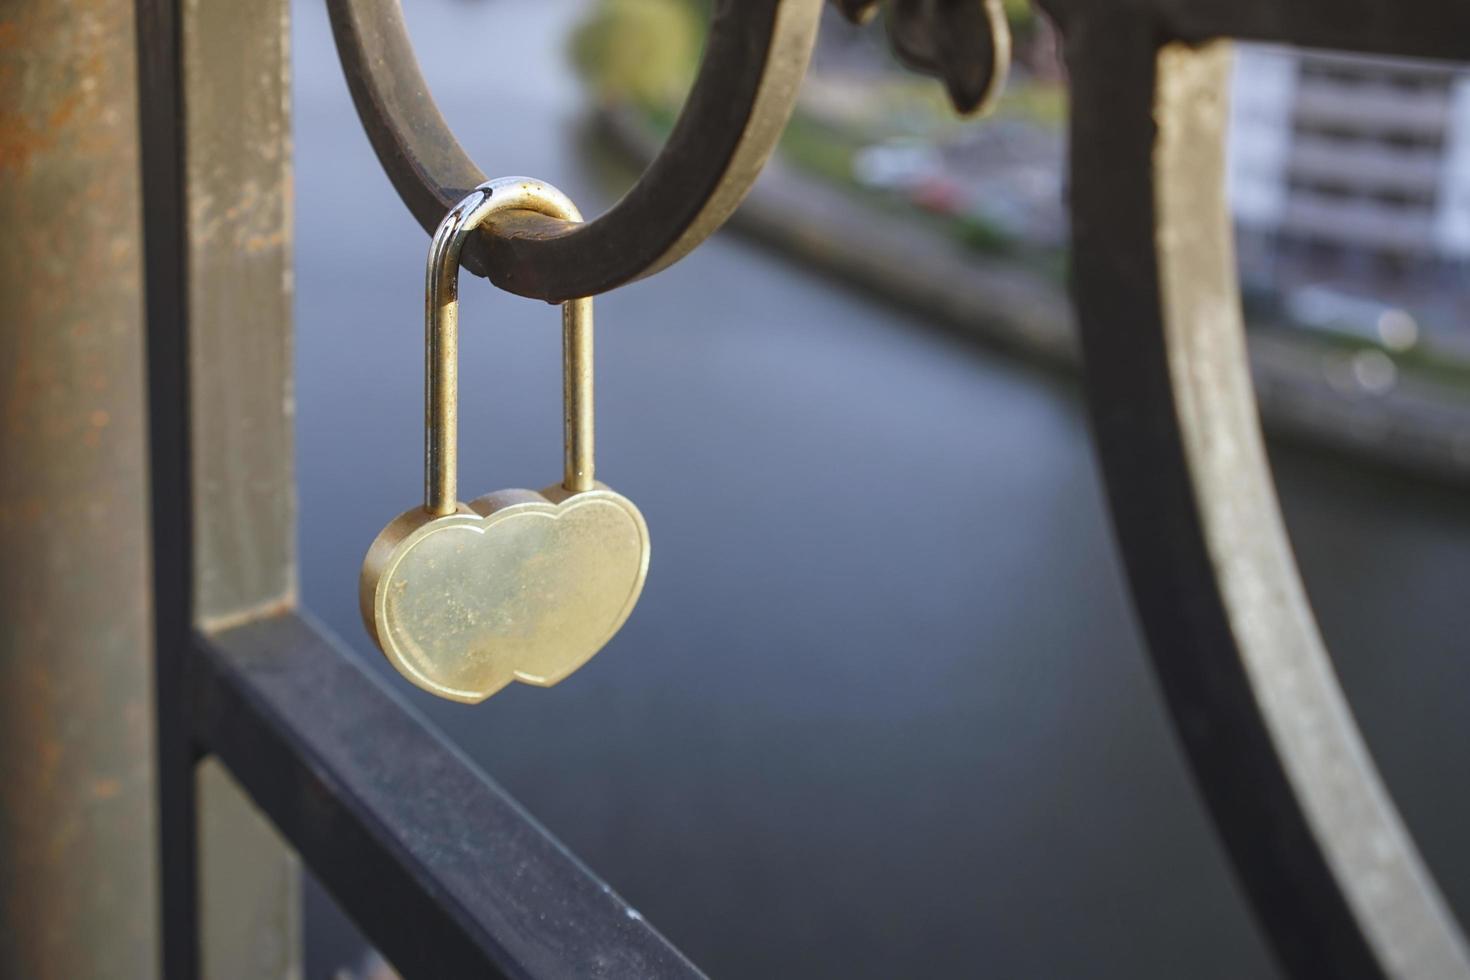 serrure en métal symbole de l'amour photo